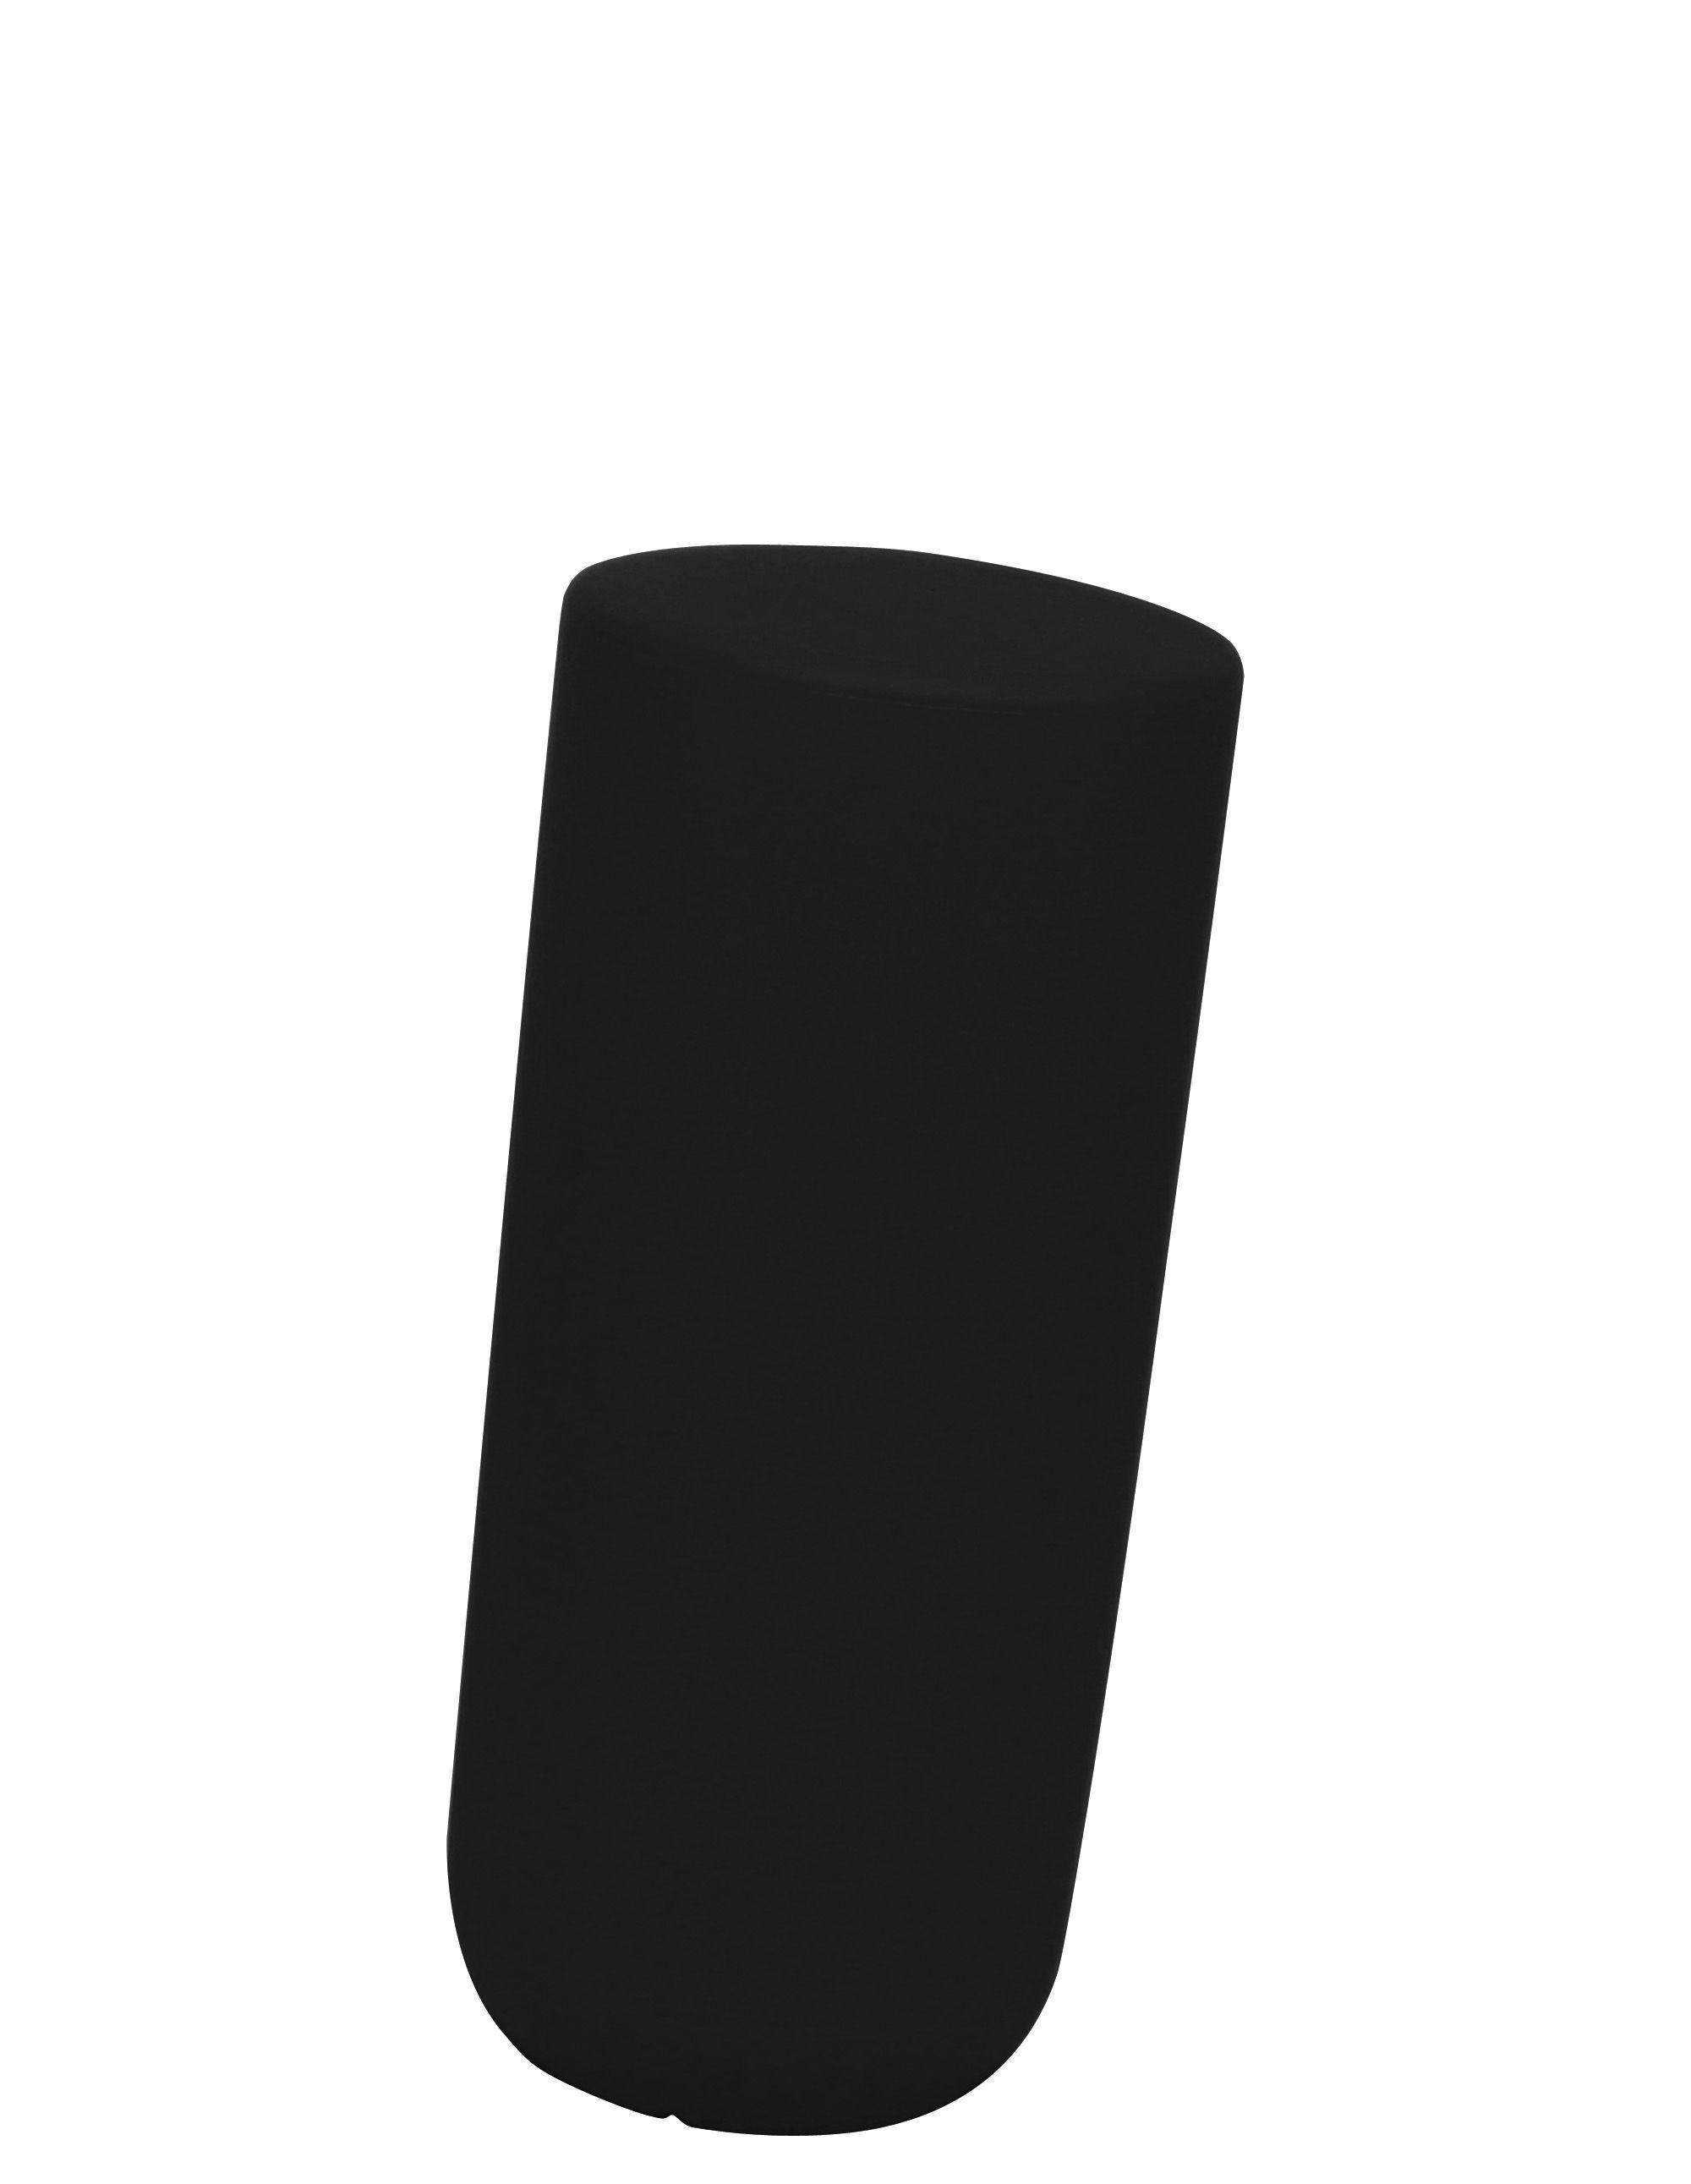 Arredamento - Mobili Ados  - Sgabello Sway - H 50 cm di Thelermont Hupton - Nero - Polietilene